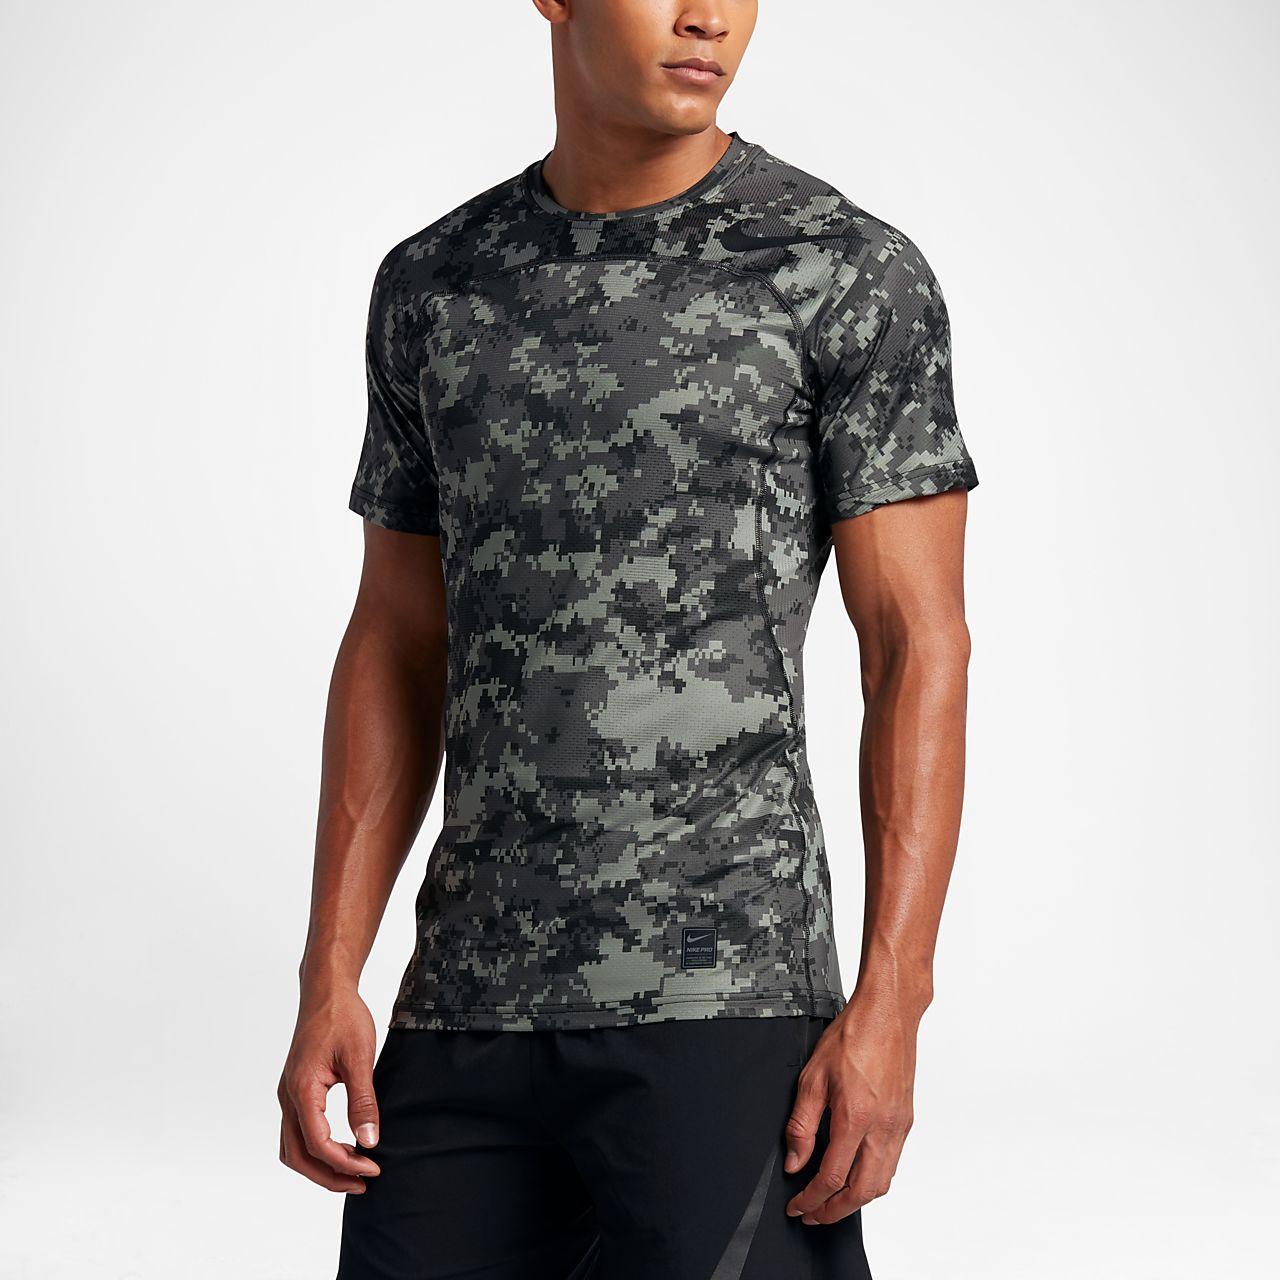 276dc32dc1eb Nike Pro Combat Hypercool Sleeveless T Shirt Mens - BCD Tofu House